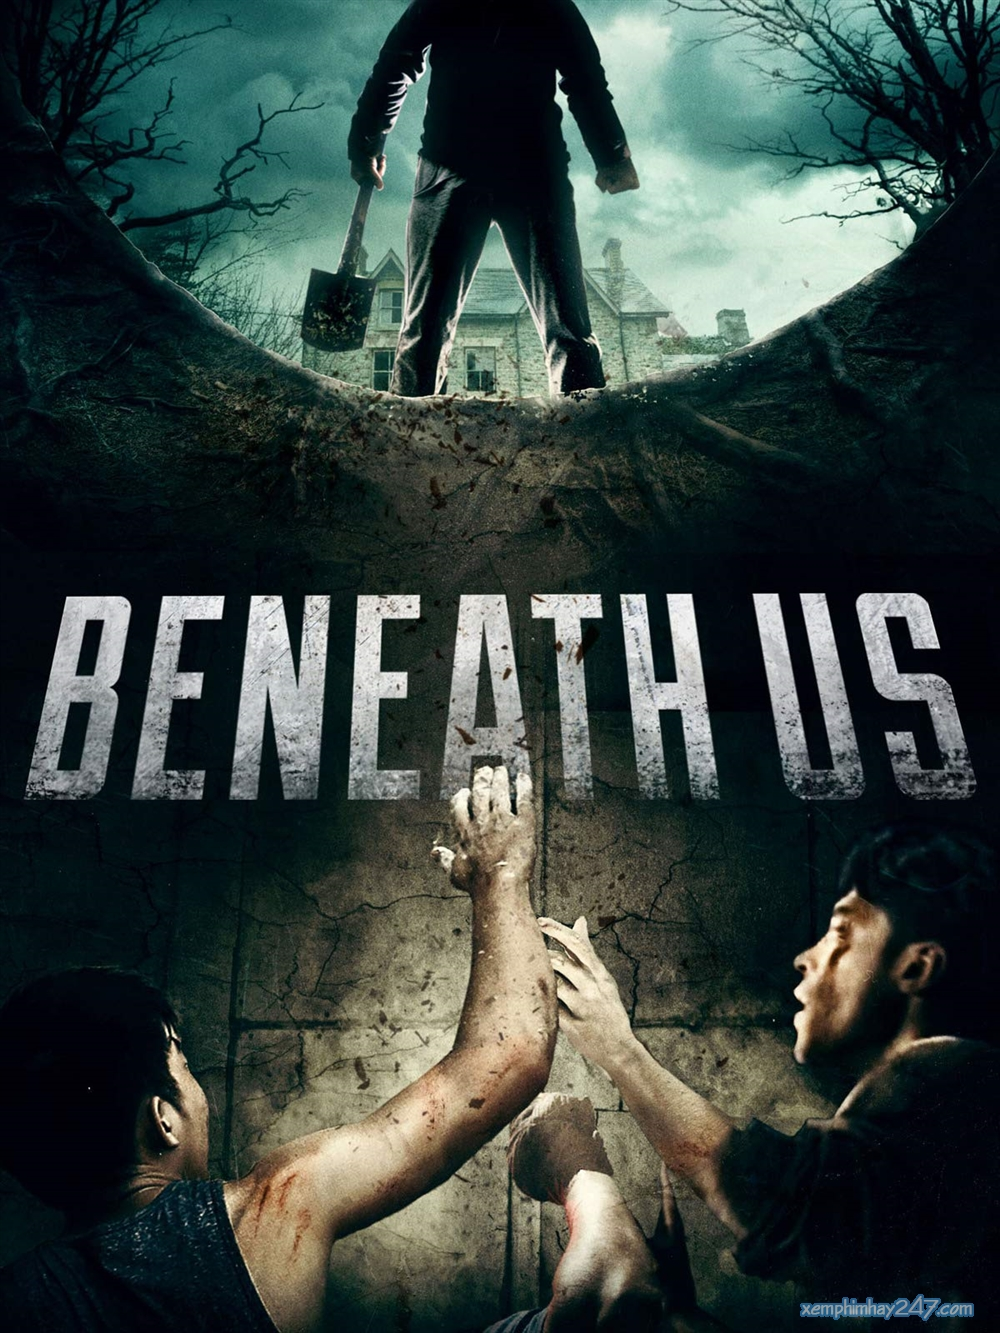 http://xemphimhay247.com - Xem phim hay 247 - Bẫy Ngầm (2019) - Beneath Us (2019)